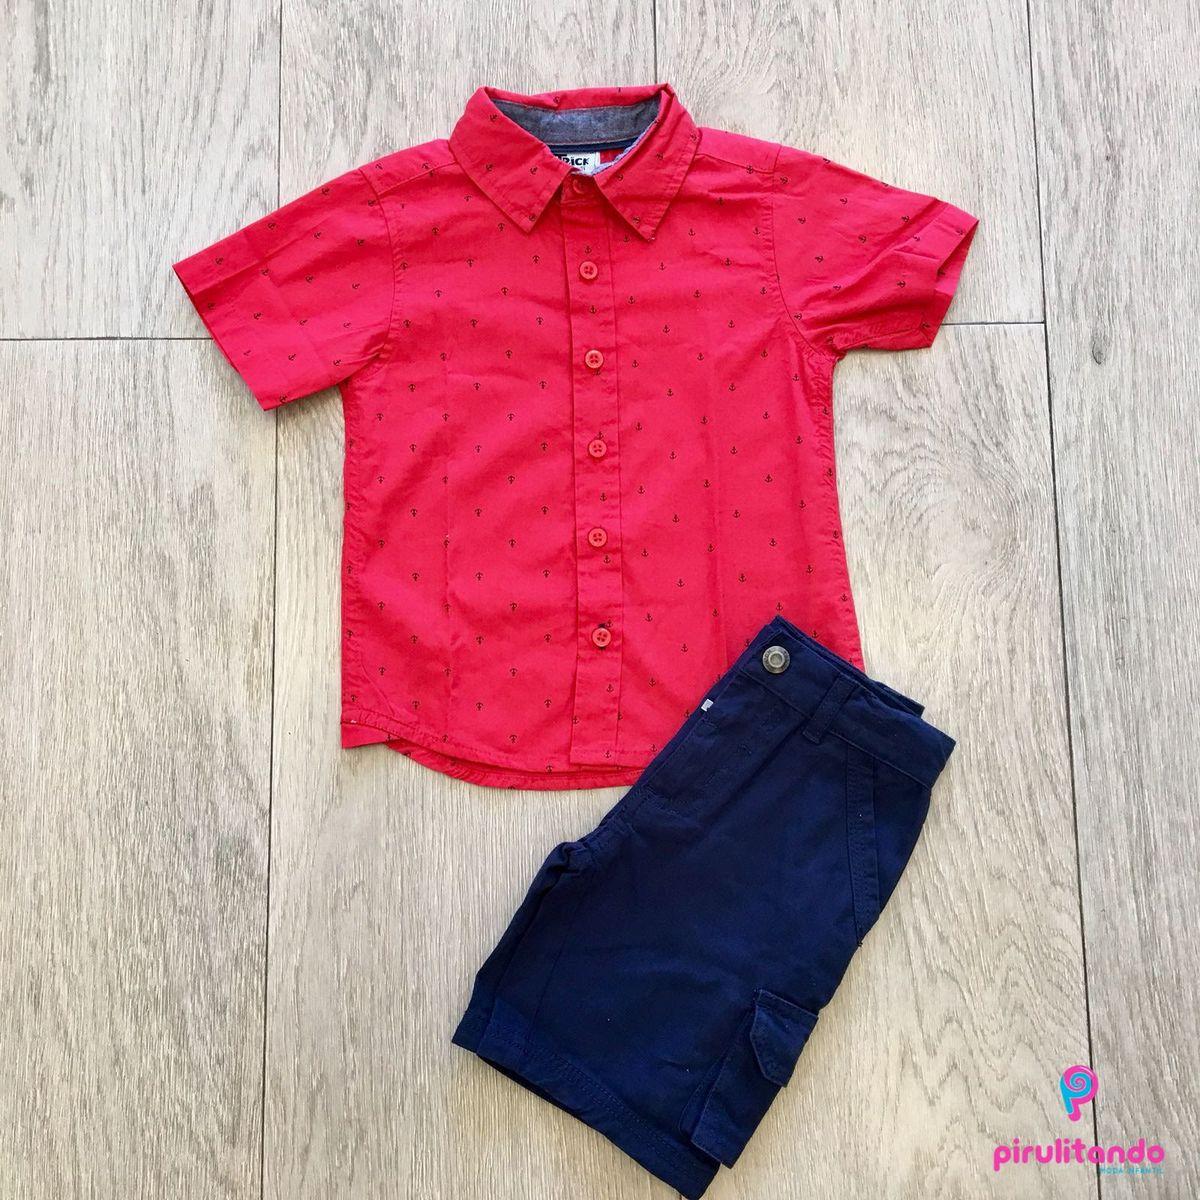 ... camisa pólo e bermuda - menino trick nick.  Czm6ly9wag90b3muzw5qb2vplmnvbs5ici9wcm9kdwn0cy8xmdi0otazms82ztq2zdqwmdq5mjc0ywu5yji2yzzhzgq3otvhnjfiny5qcgc 8ab6a61bf609a